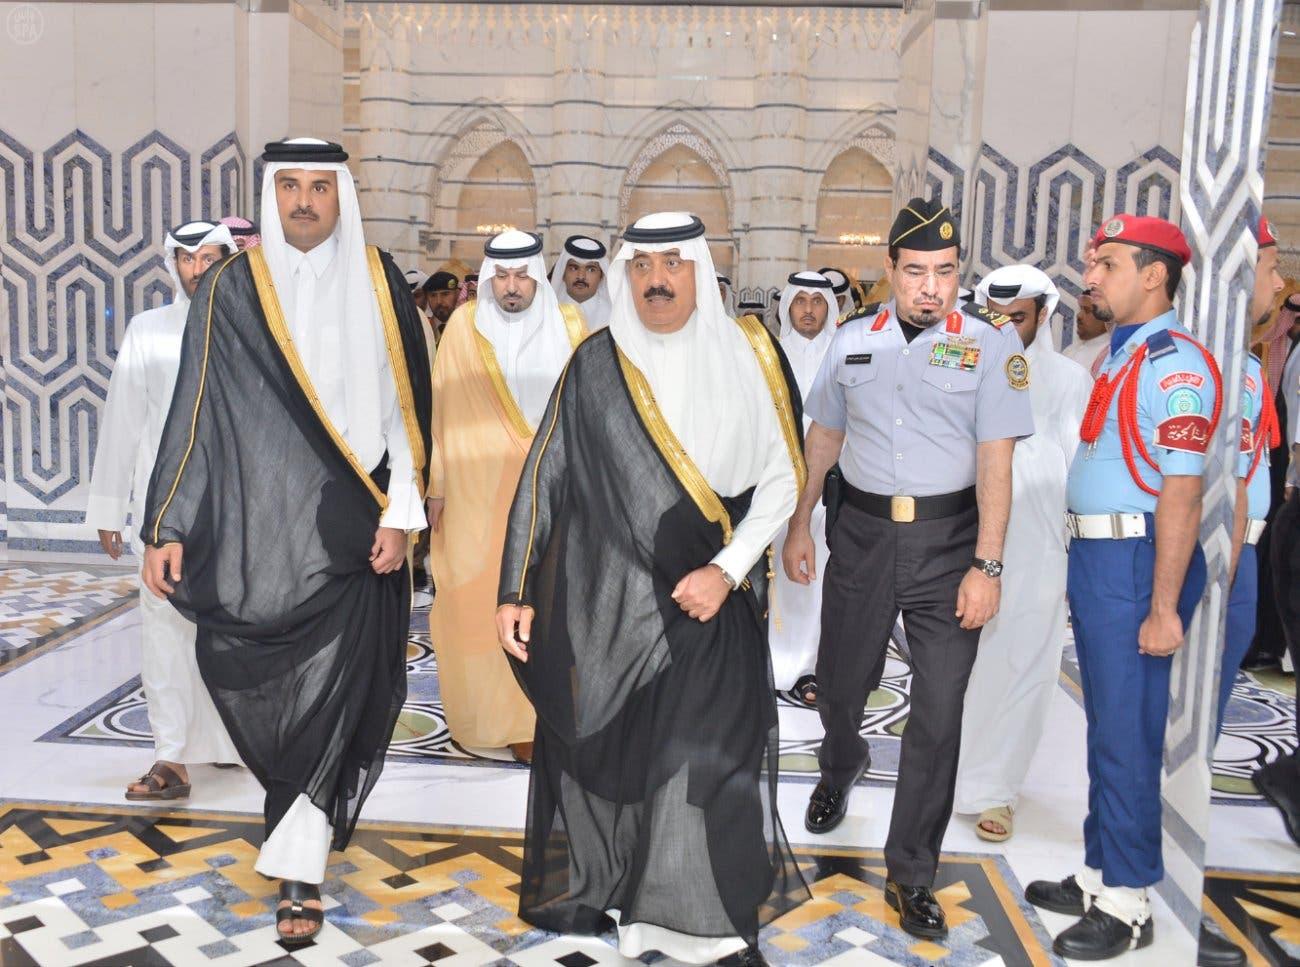 Qatari Emir Sheikh Tamim bin Hamad al-Thani, left, arrives at King Abdulaziz International Airport. (Saudi Press Agency)